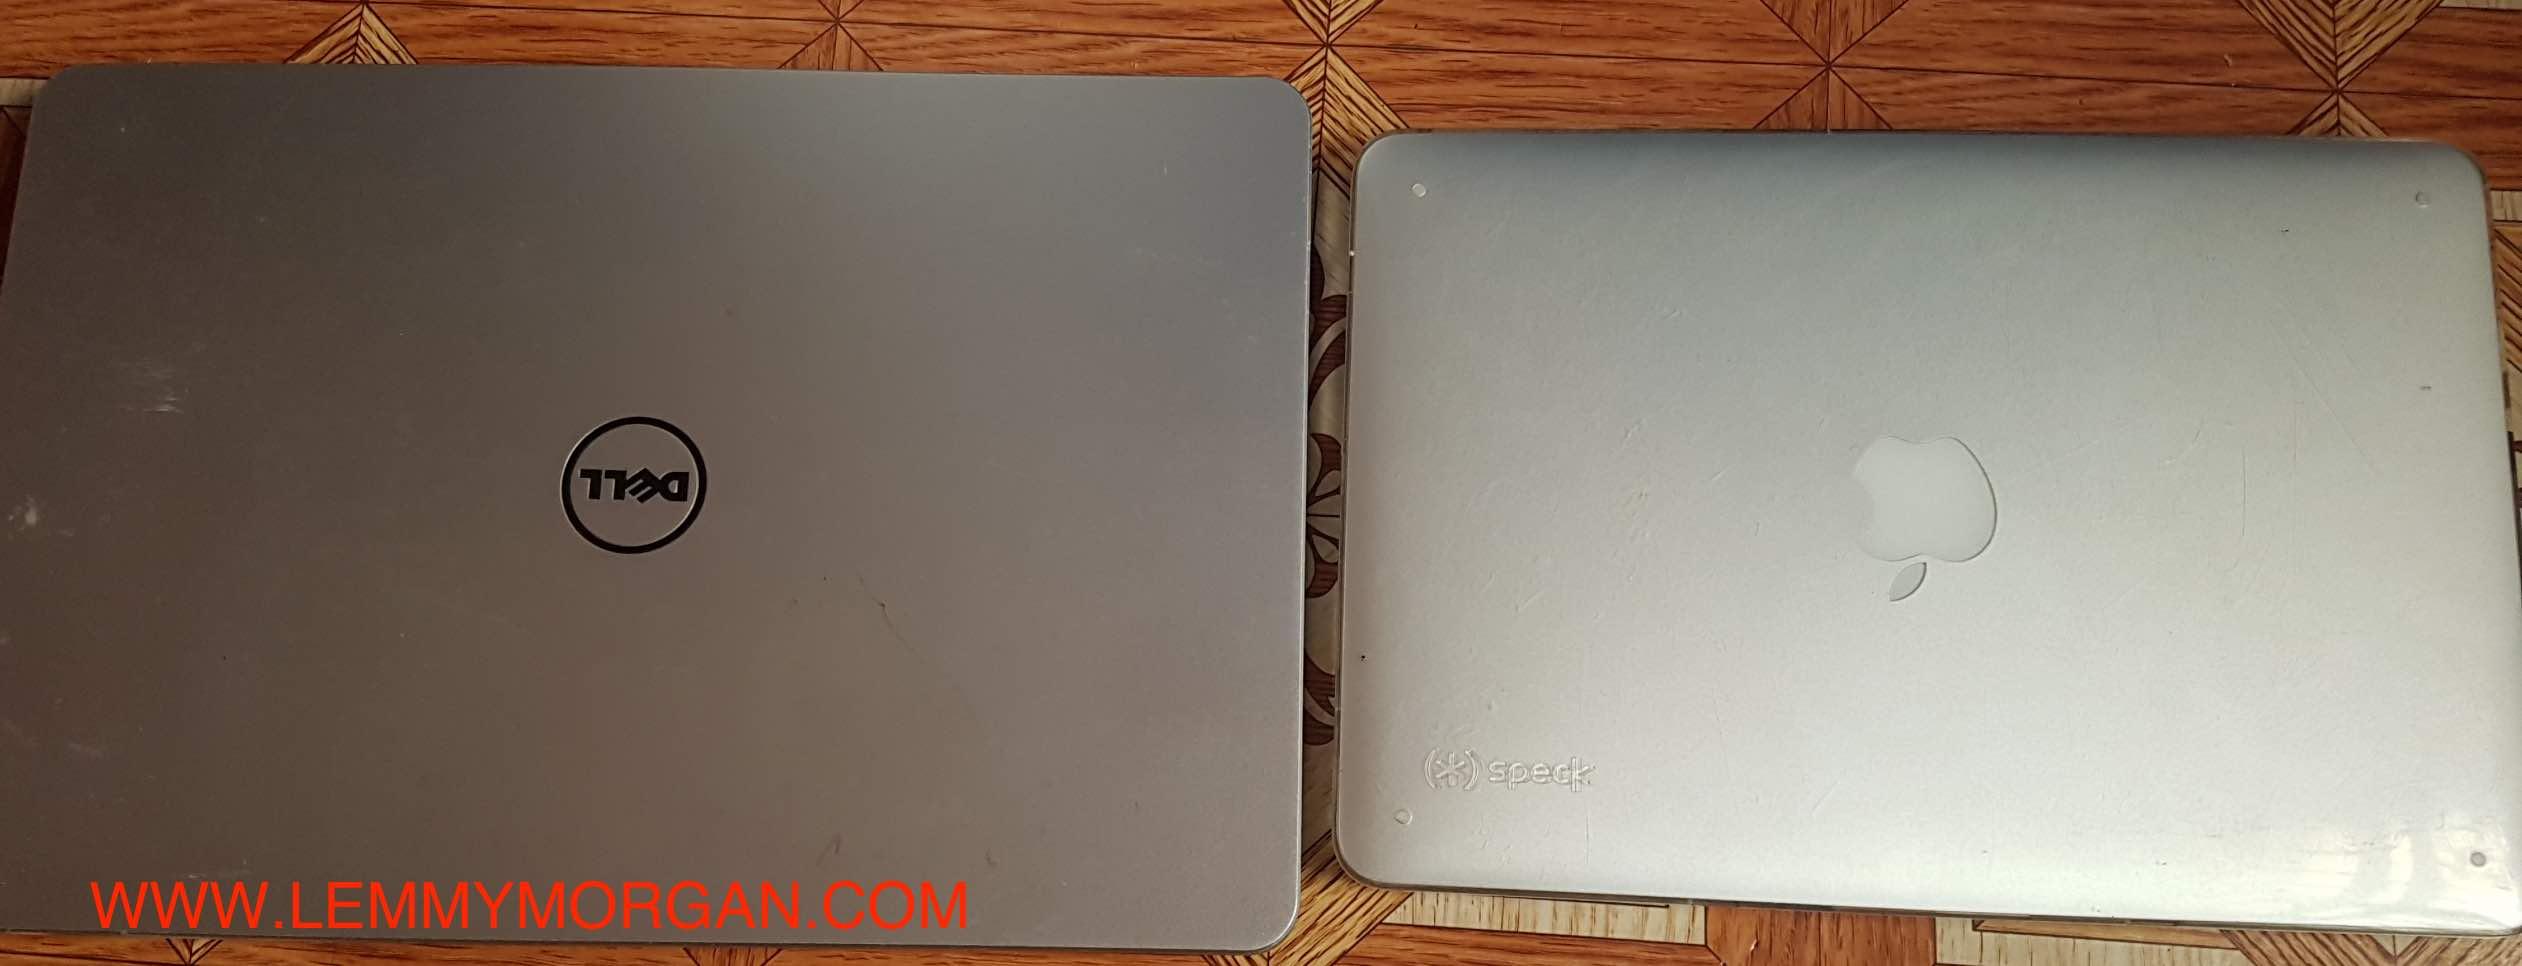 Mac Computers Vs Windows Computers: 11 Reasons why Mac is Better